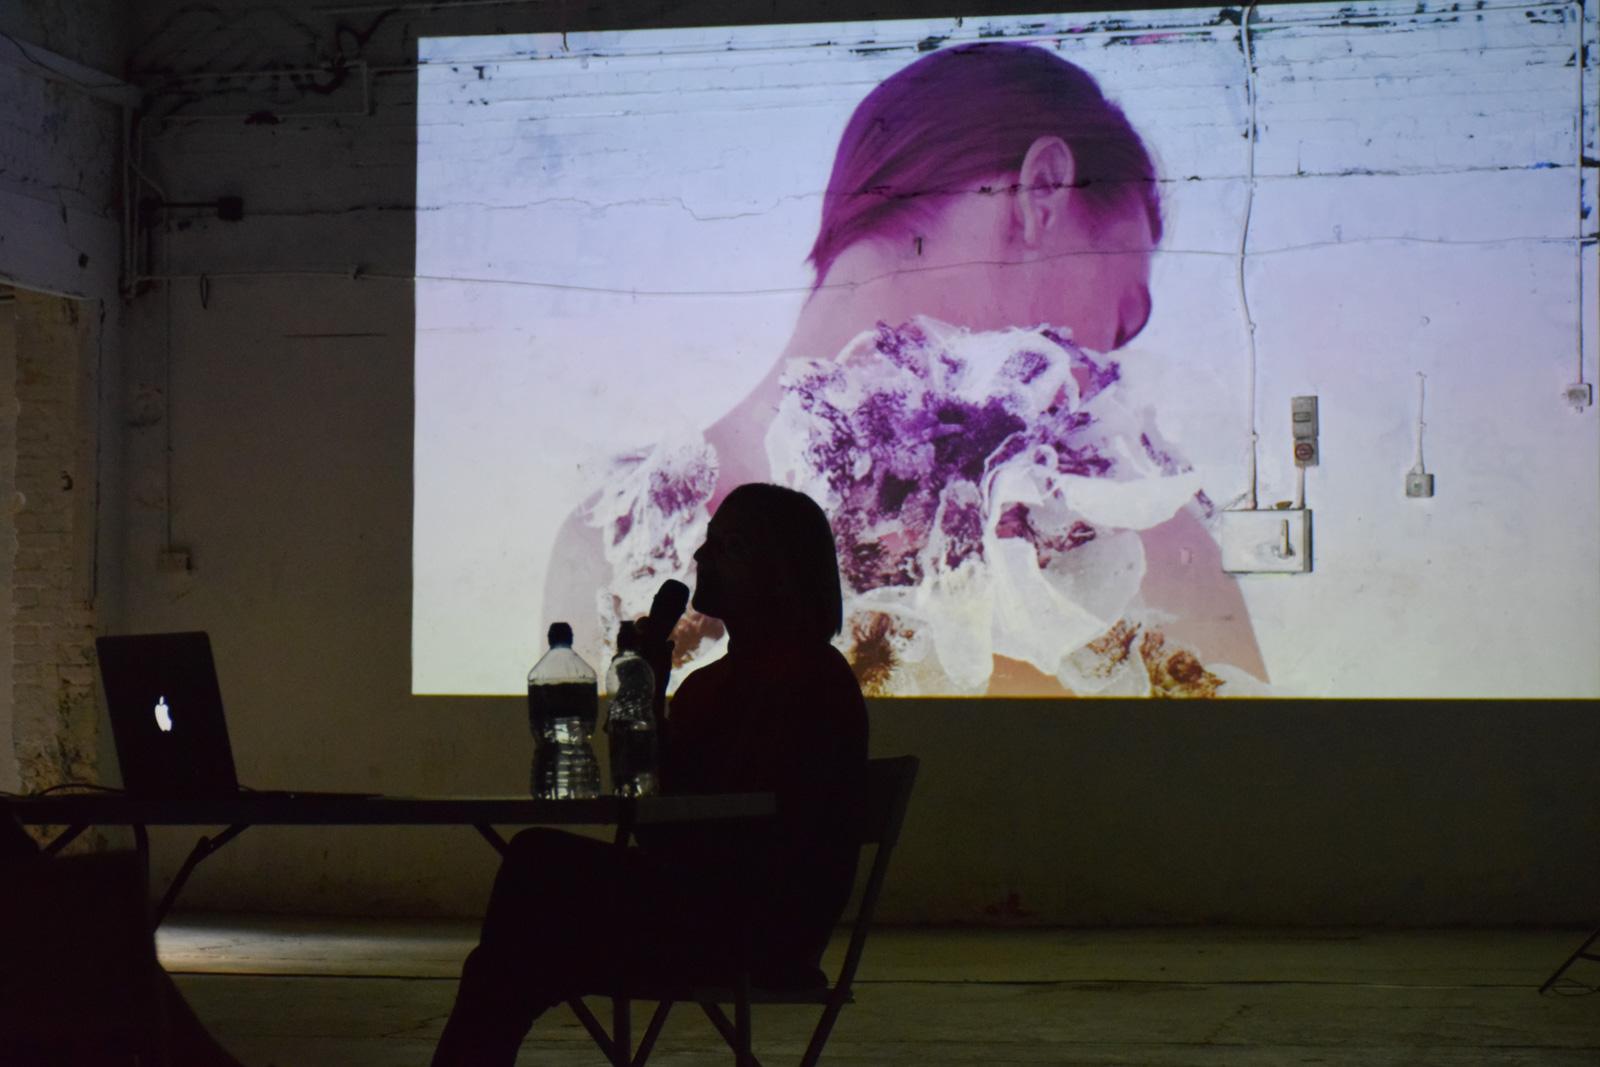 Artist Anna Neklesa speaking about near-future materials